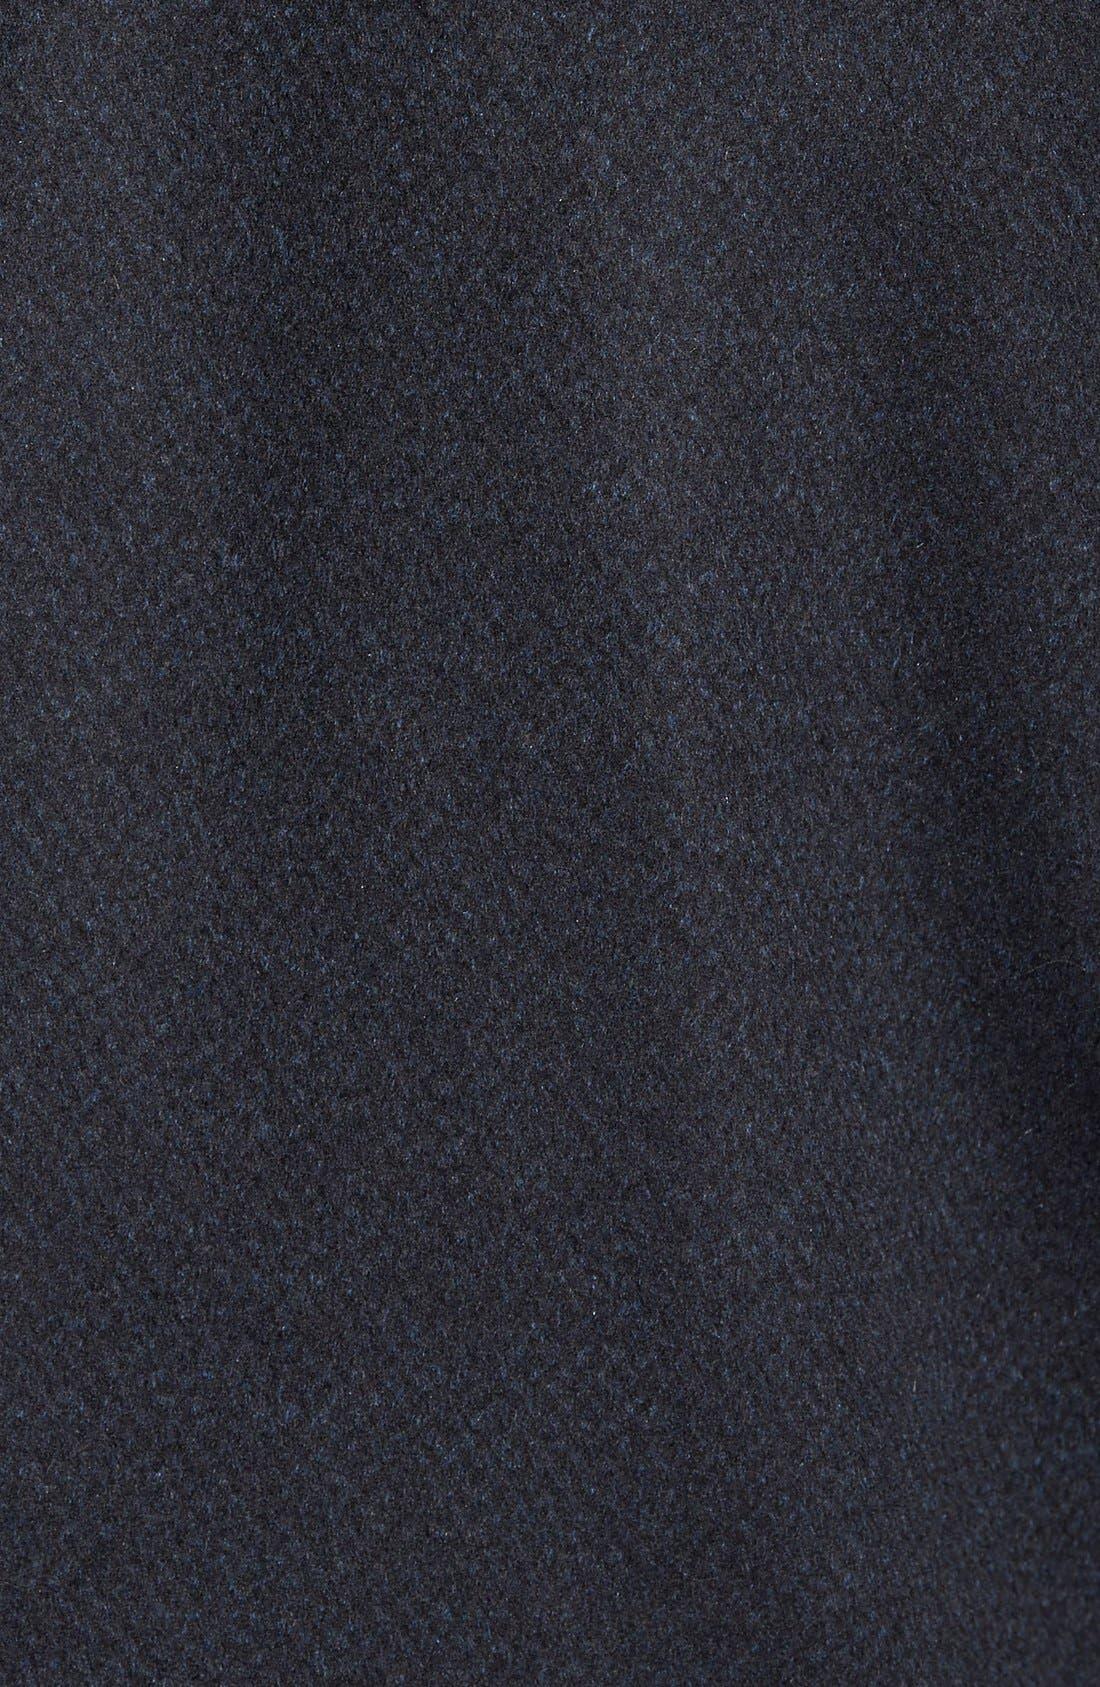 Kingman Modern Fit Wool Blend Coat with Removable Zipper Bib,                             Alternate thumbnail 10, color,